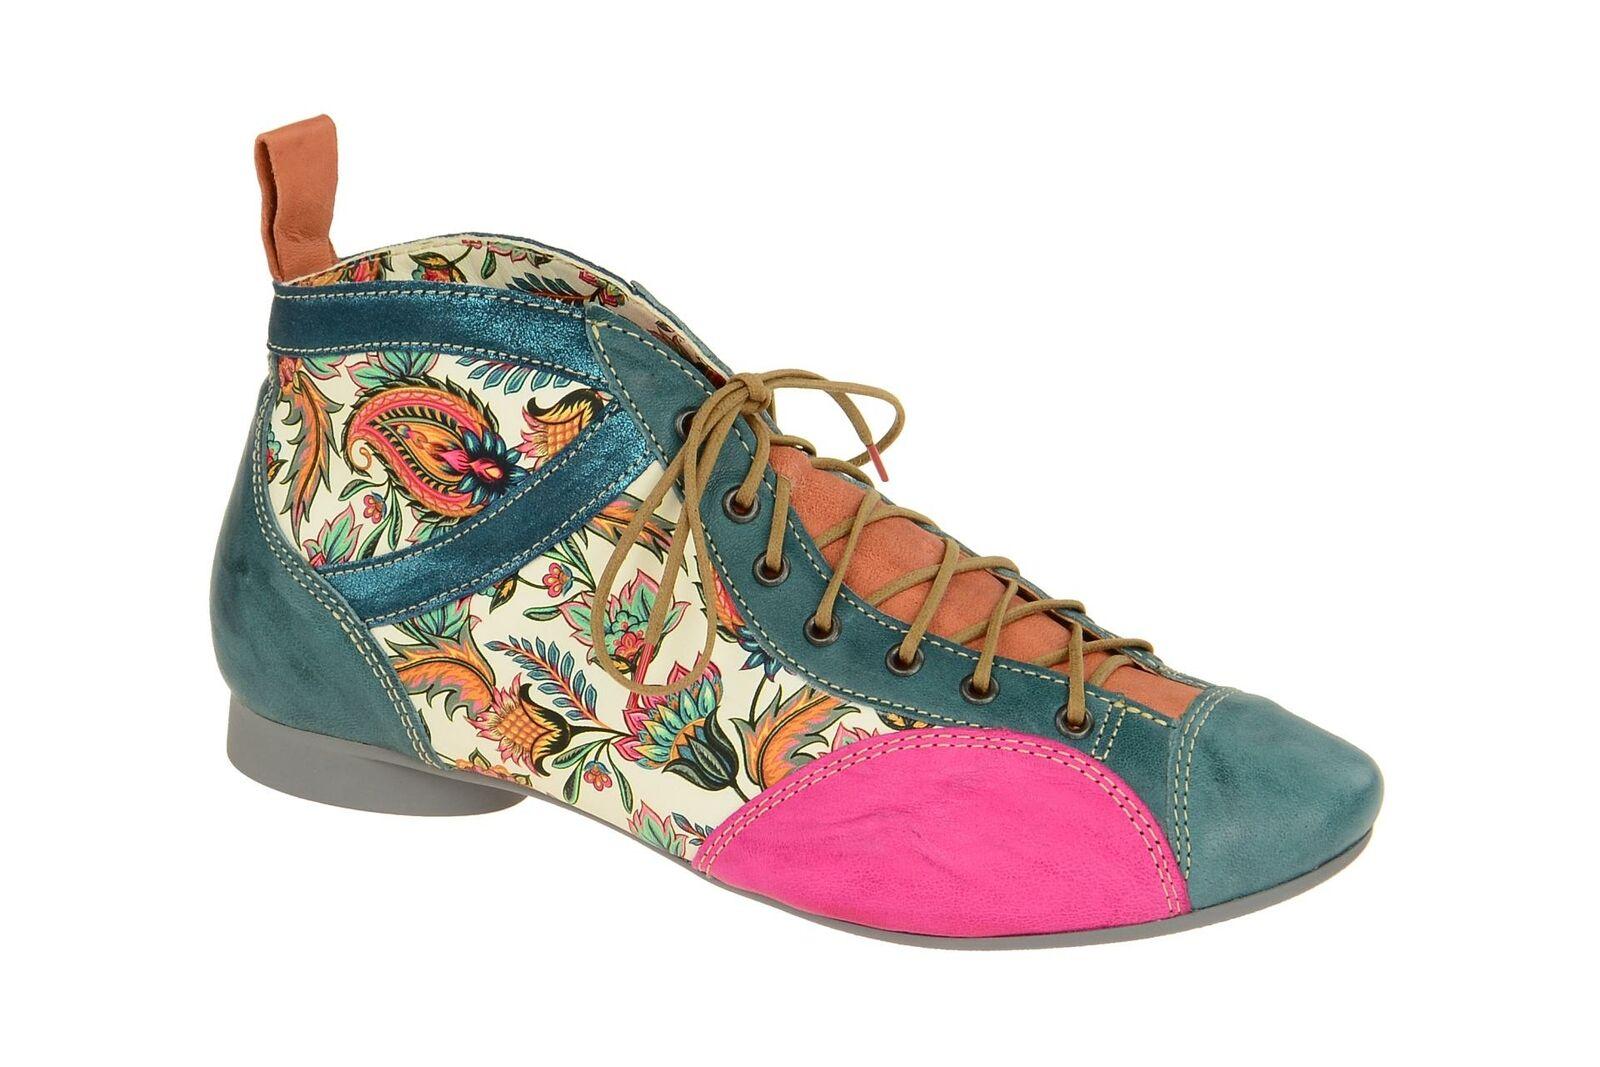 Think Schuhe GUAD blau Damen Stiefeletten bequeme Stiefelette 2-82288-79 NEU